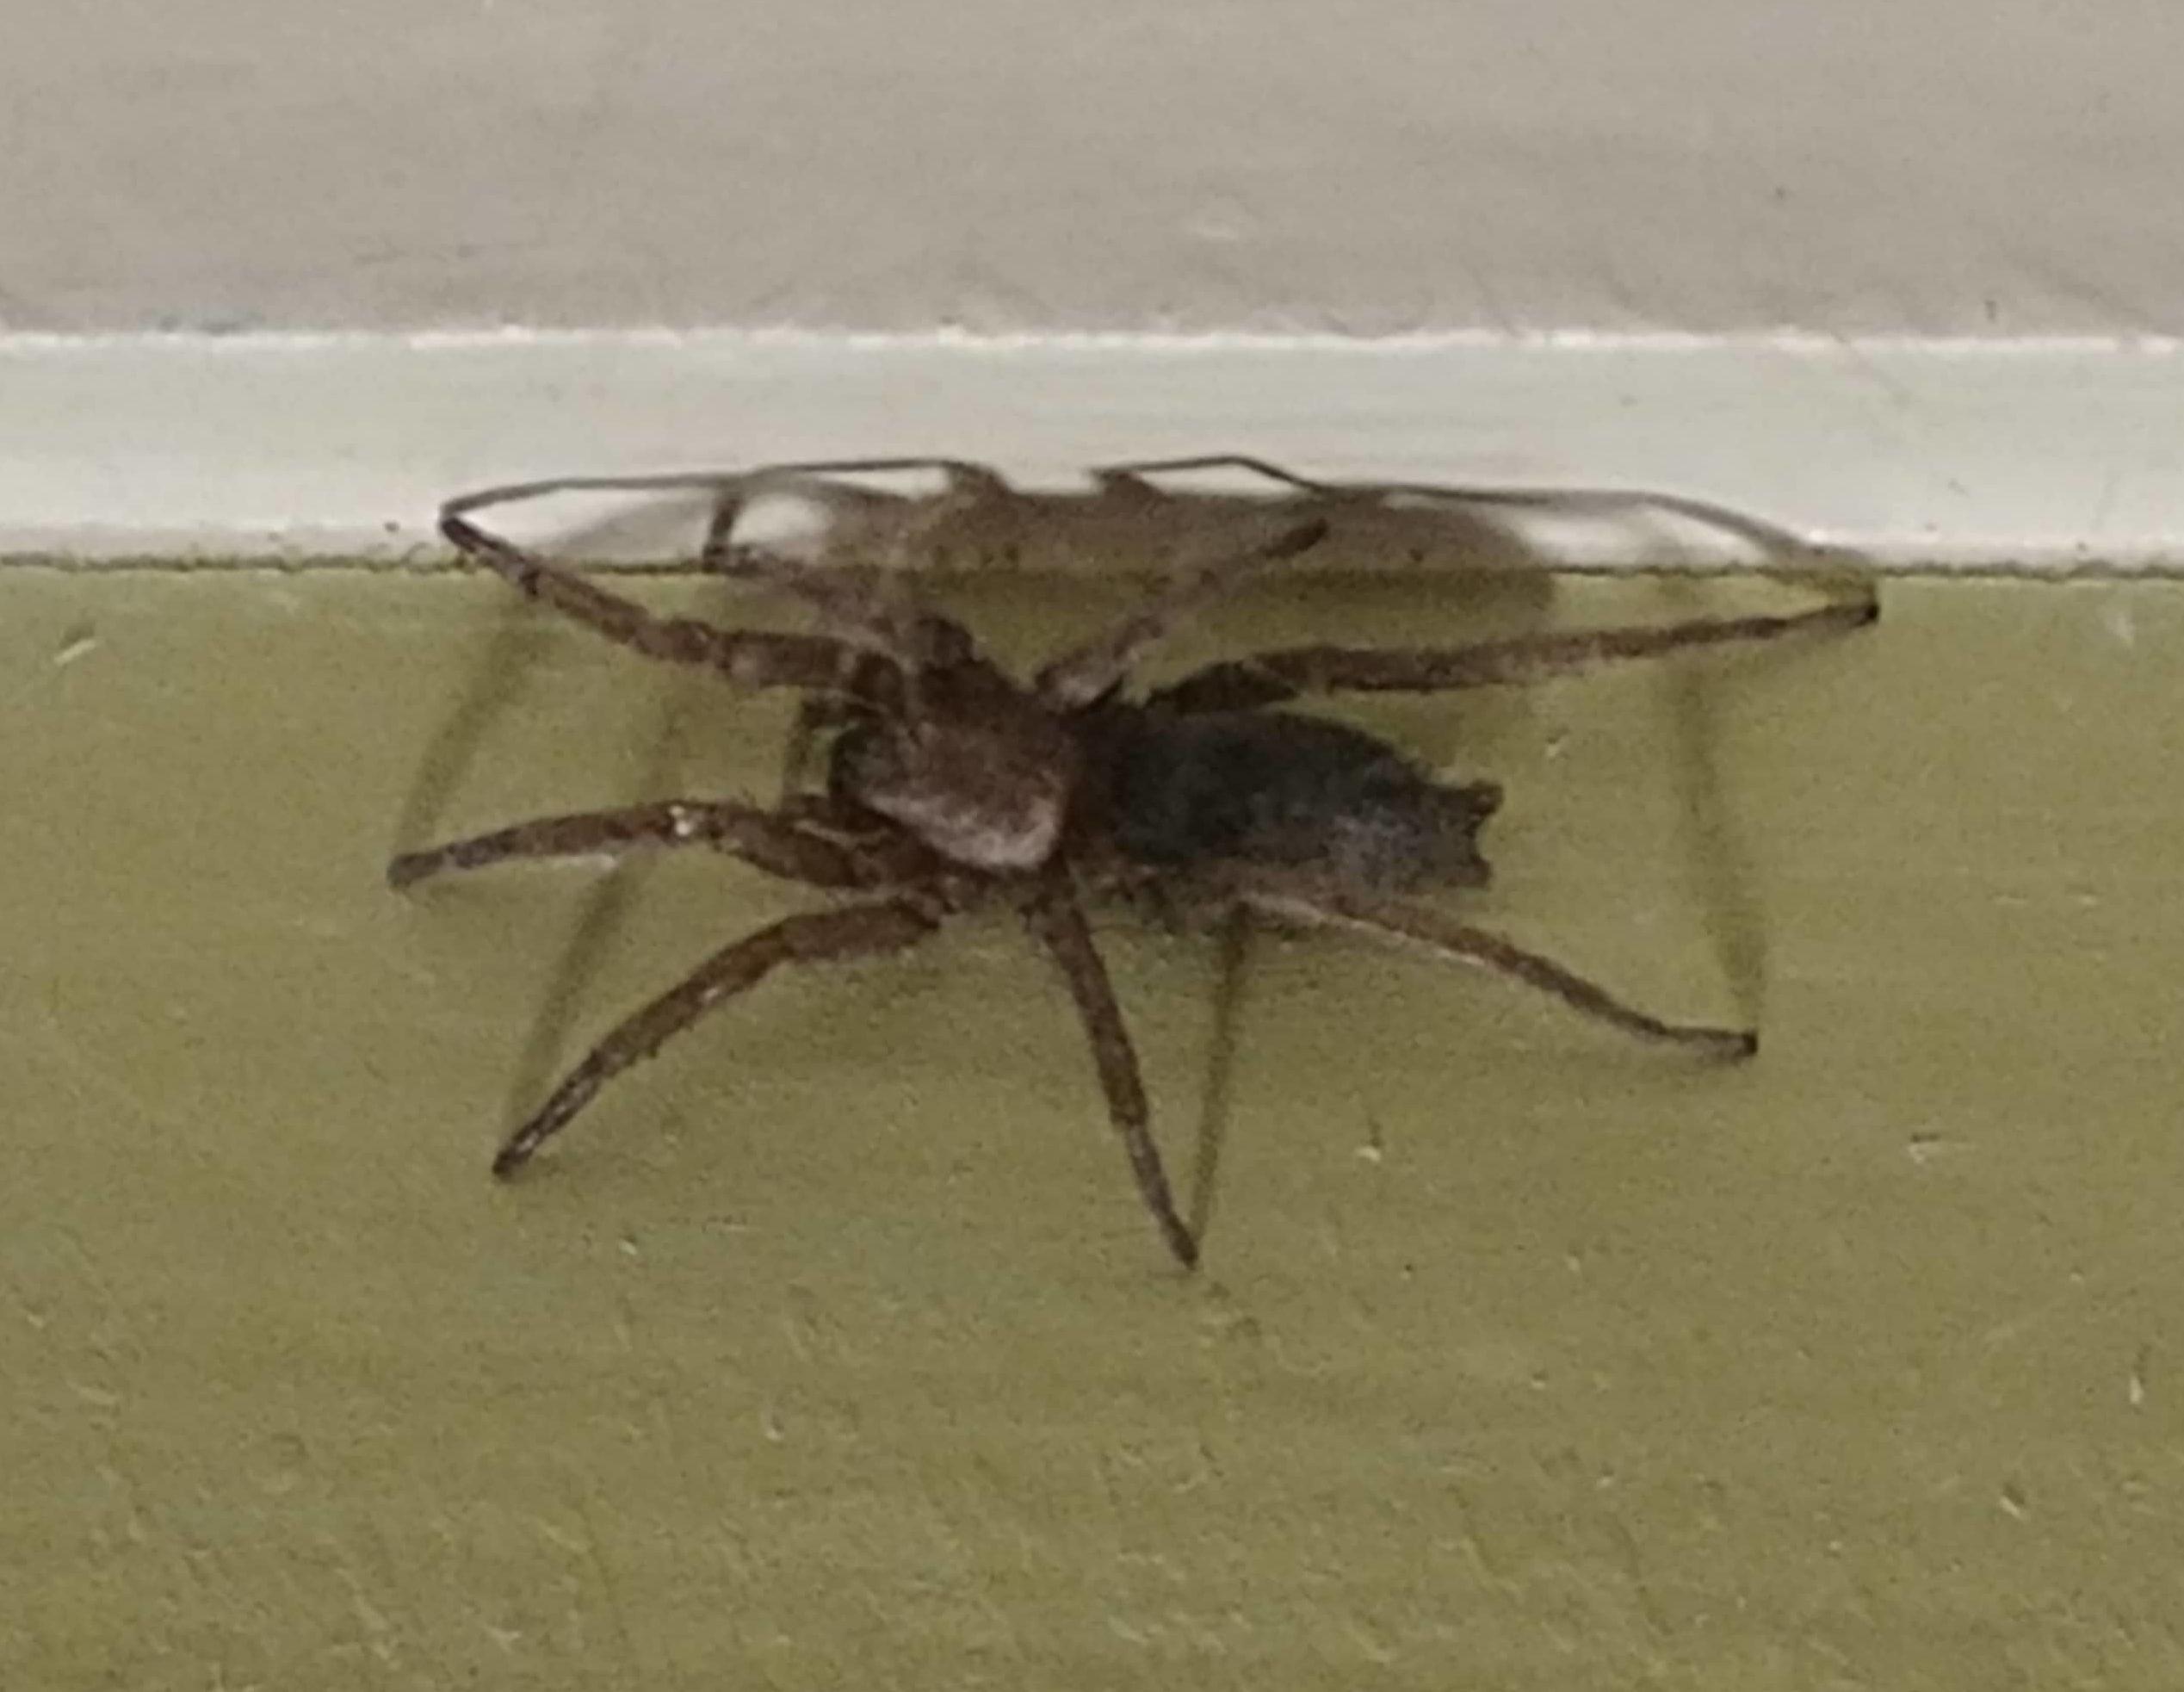 Picture of Scotophaeus blackwalli (Mouse Spider) - Dorsal